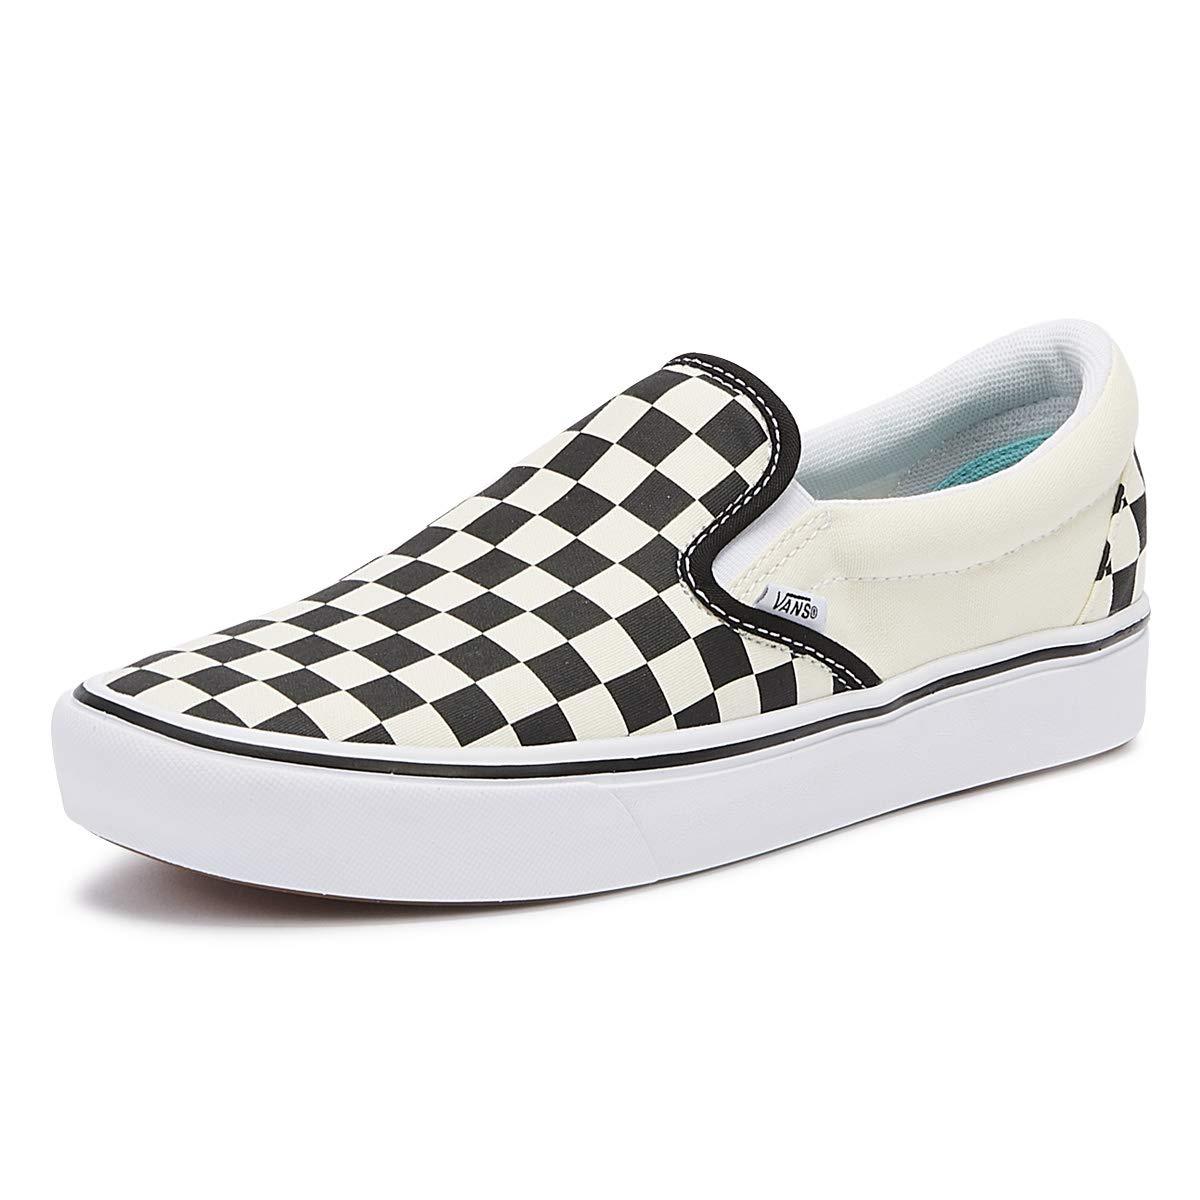 Vans ComfyCush Slip On Schuhe (Classic), Black Checkerboard, 38 EU